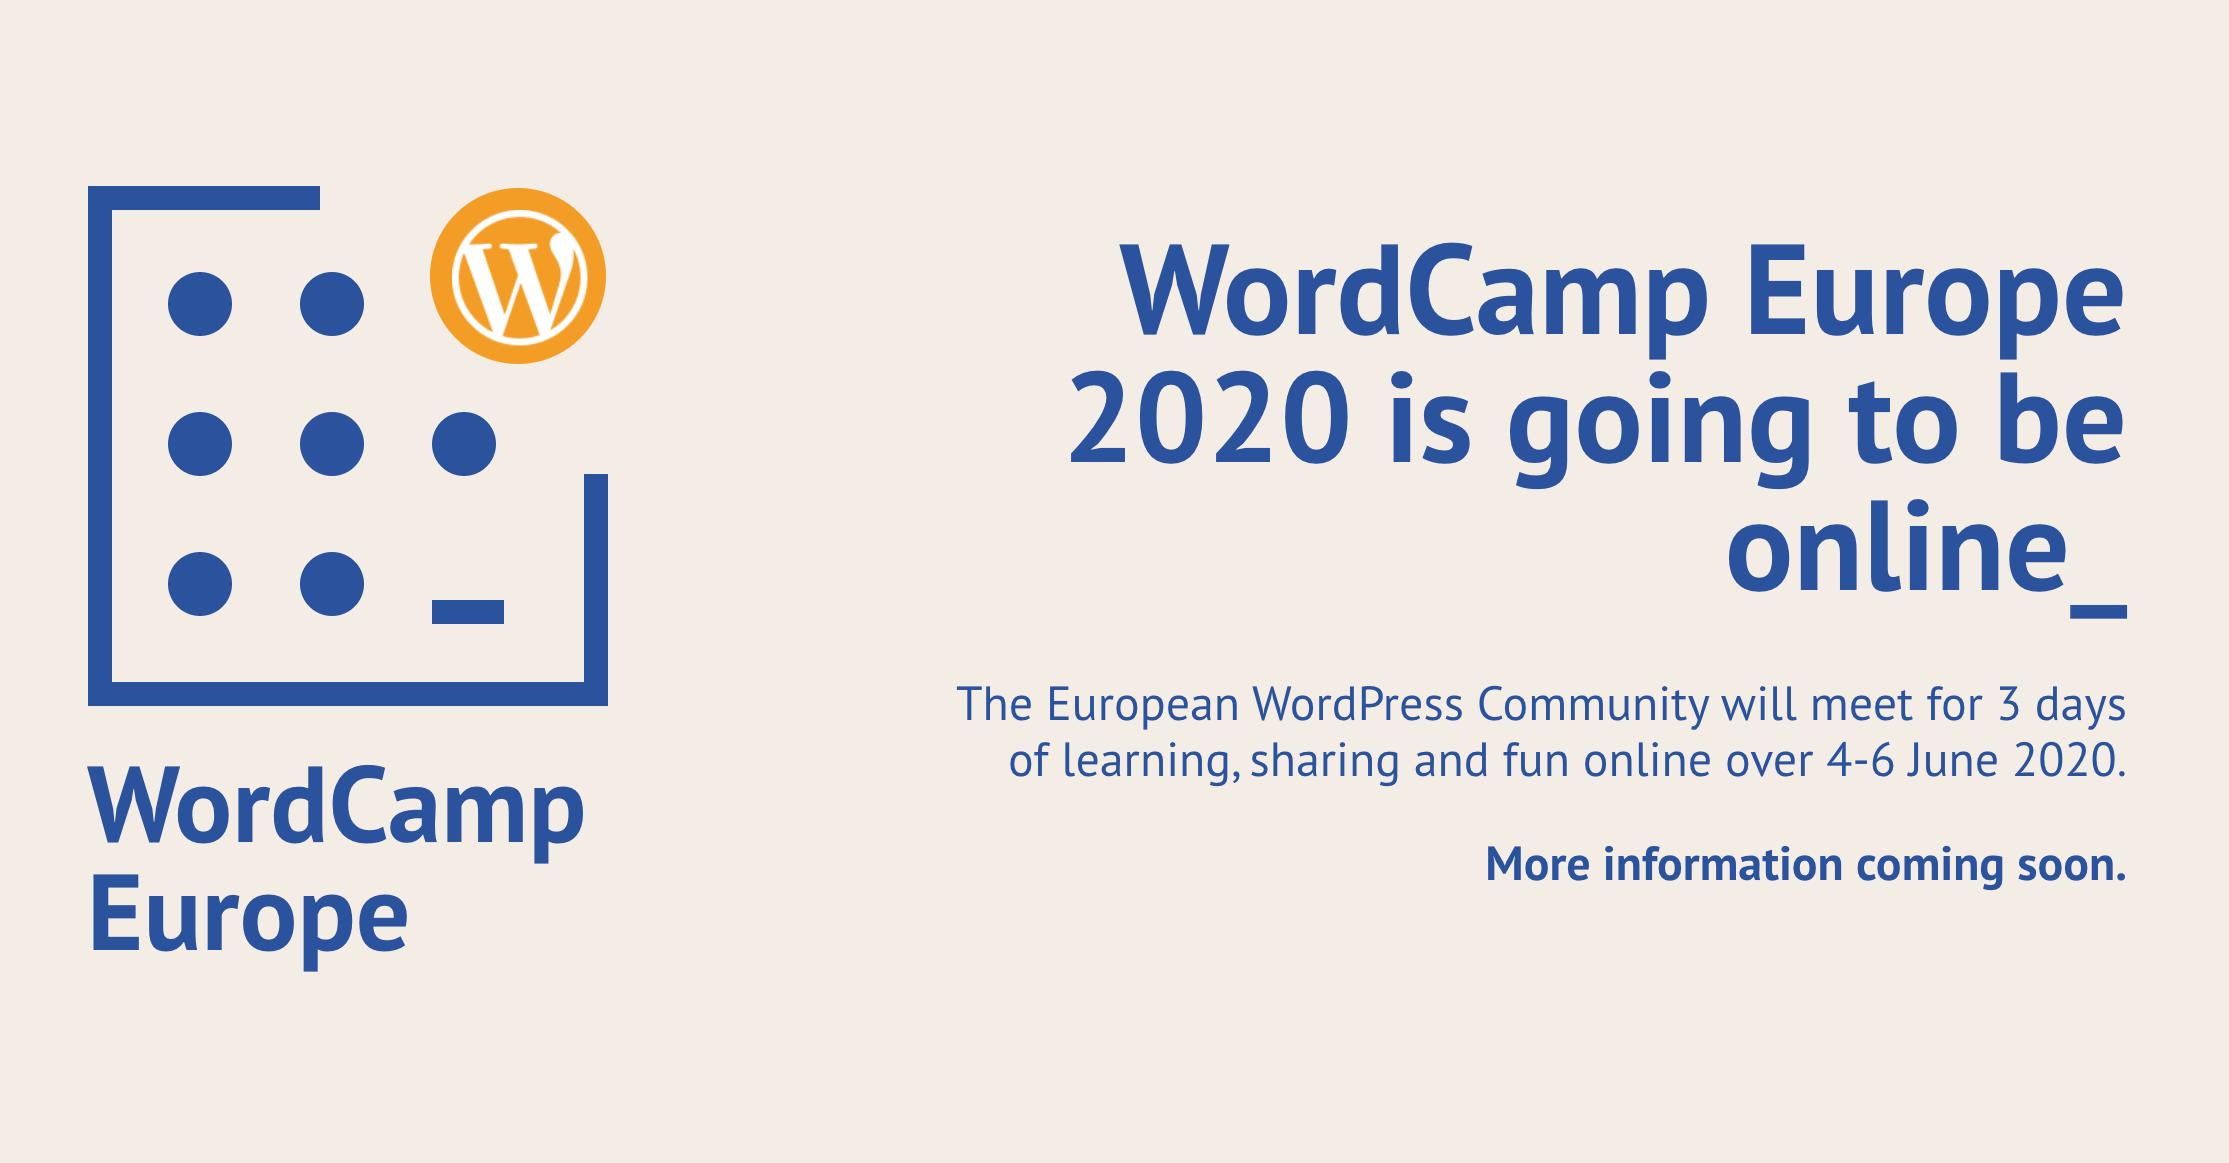 word camp europe 2020 online